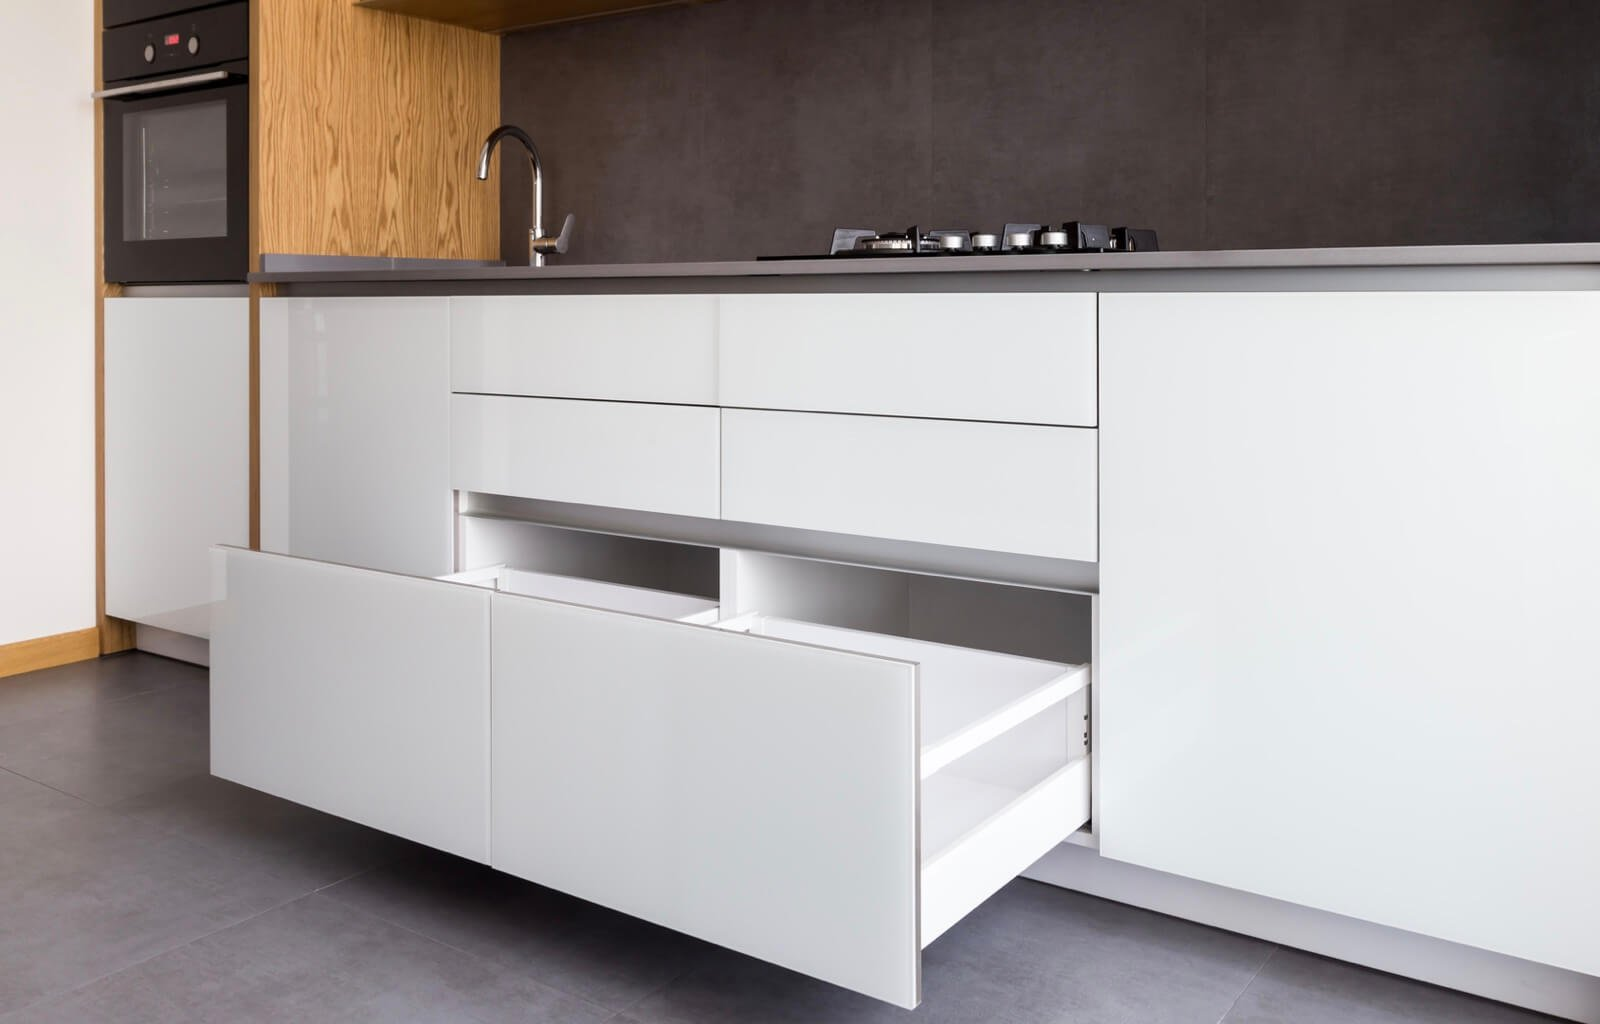 Full Size of Küchenblende Wand Küche Blende Unten Küchenblende Hängeschrank Sockelblende Küche 120 Mm Küche Küche Blende